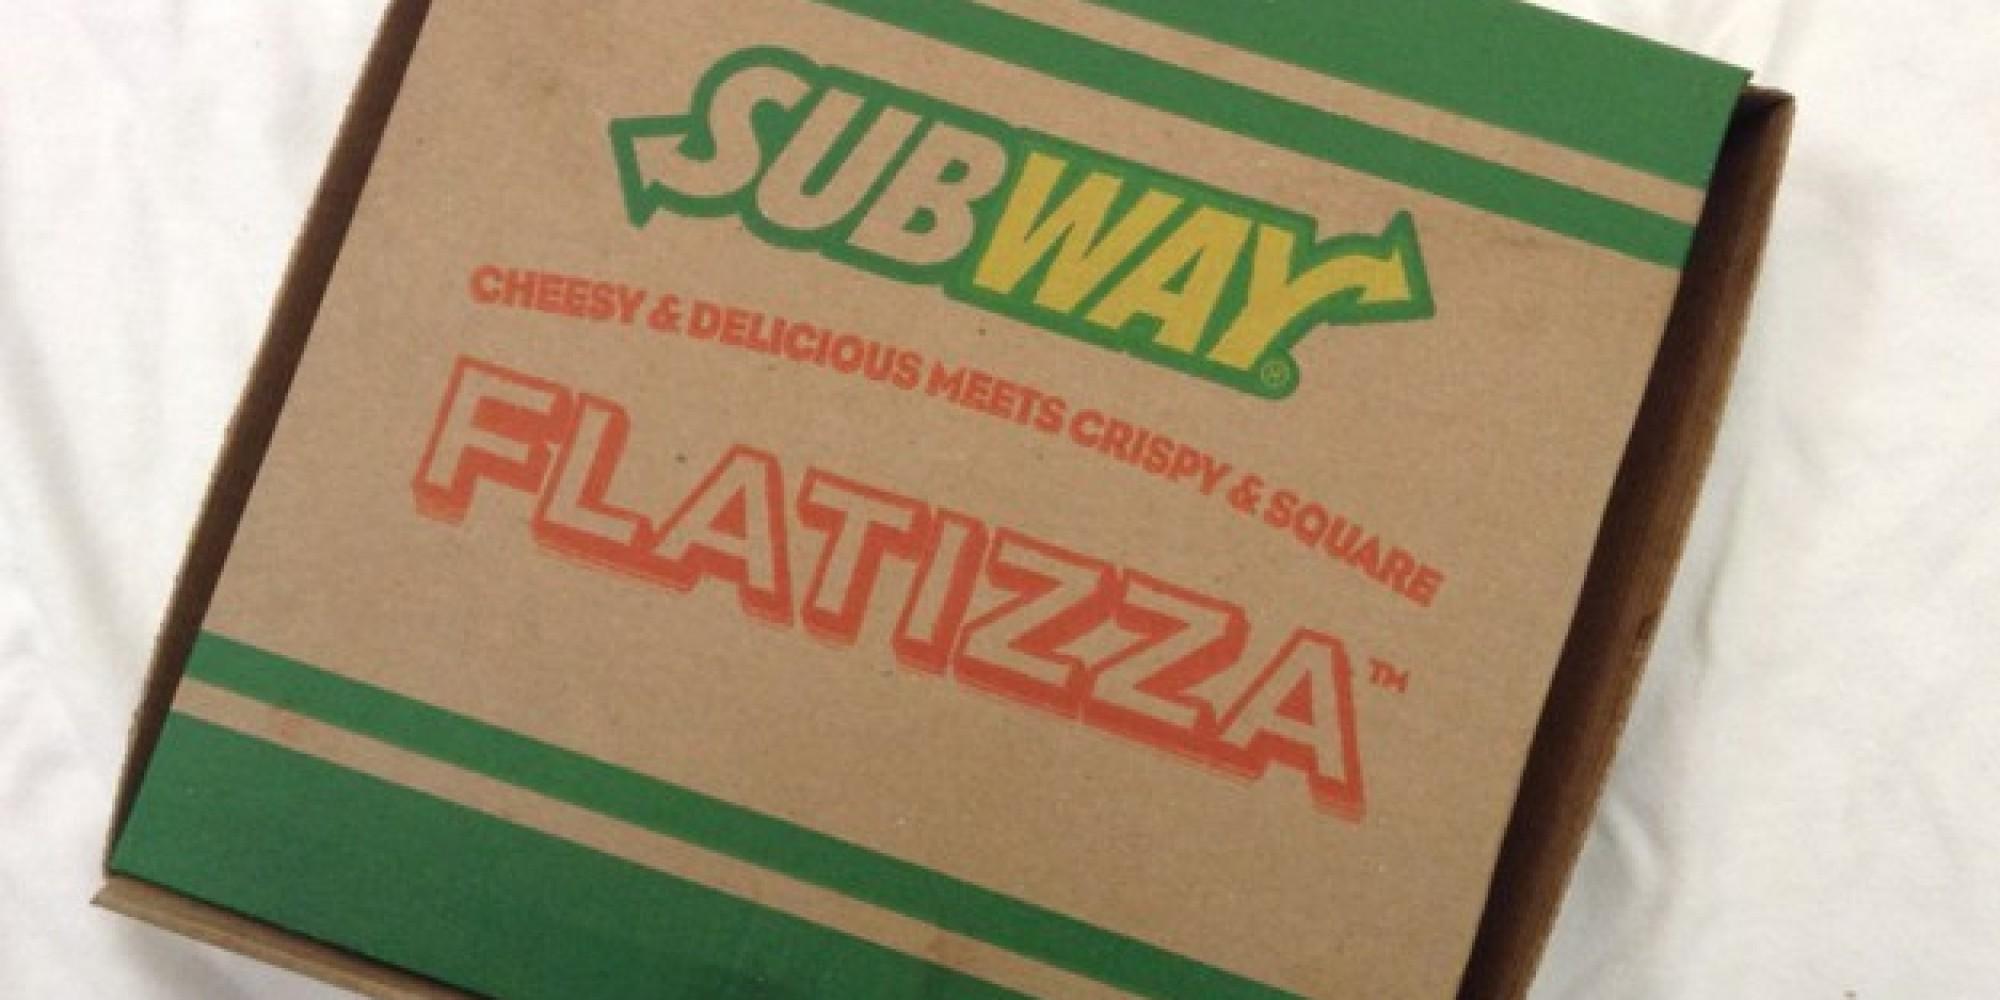 Subway Has a New Menu Item